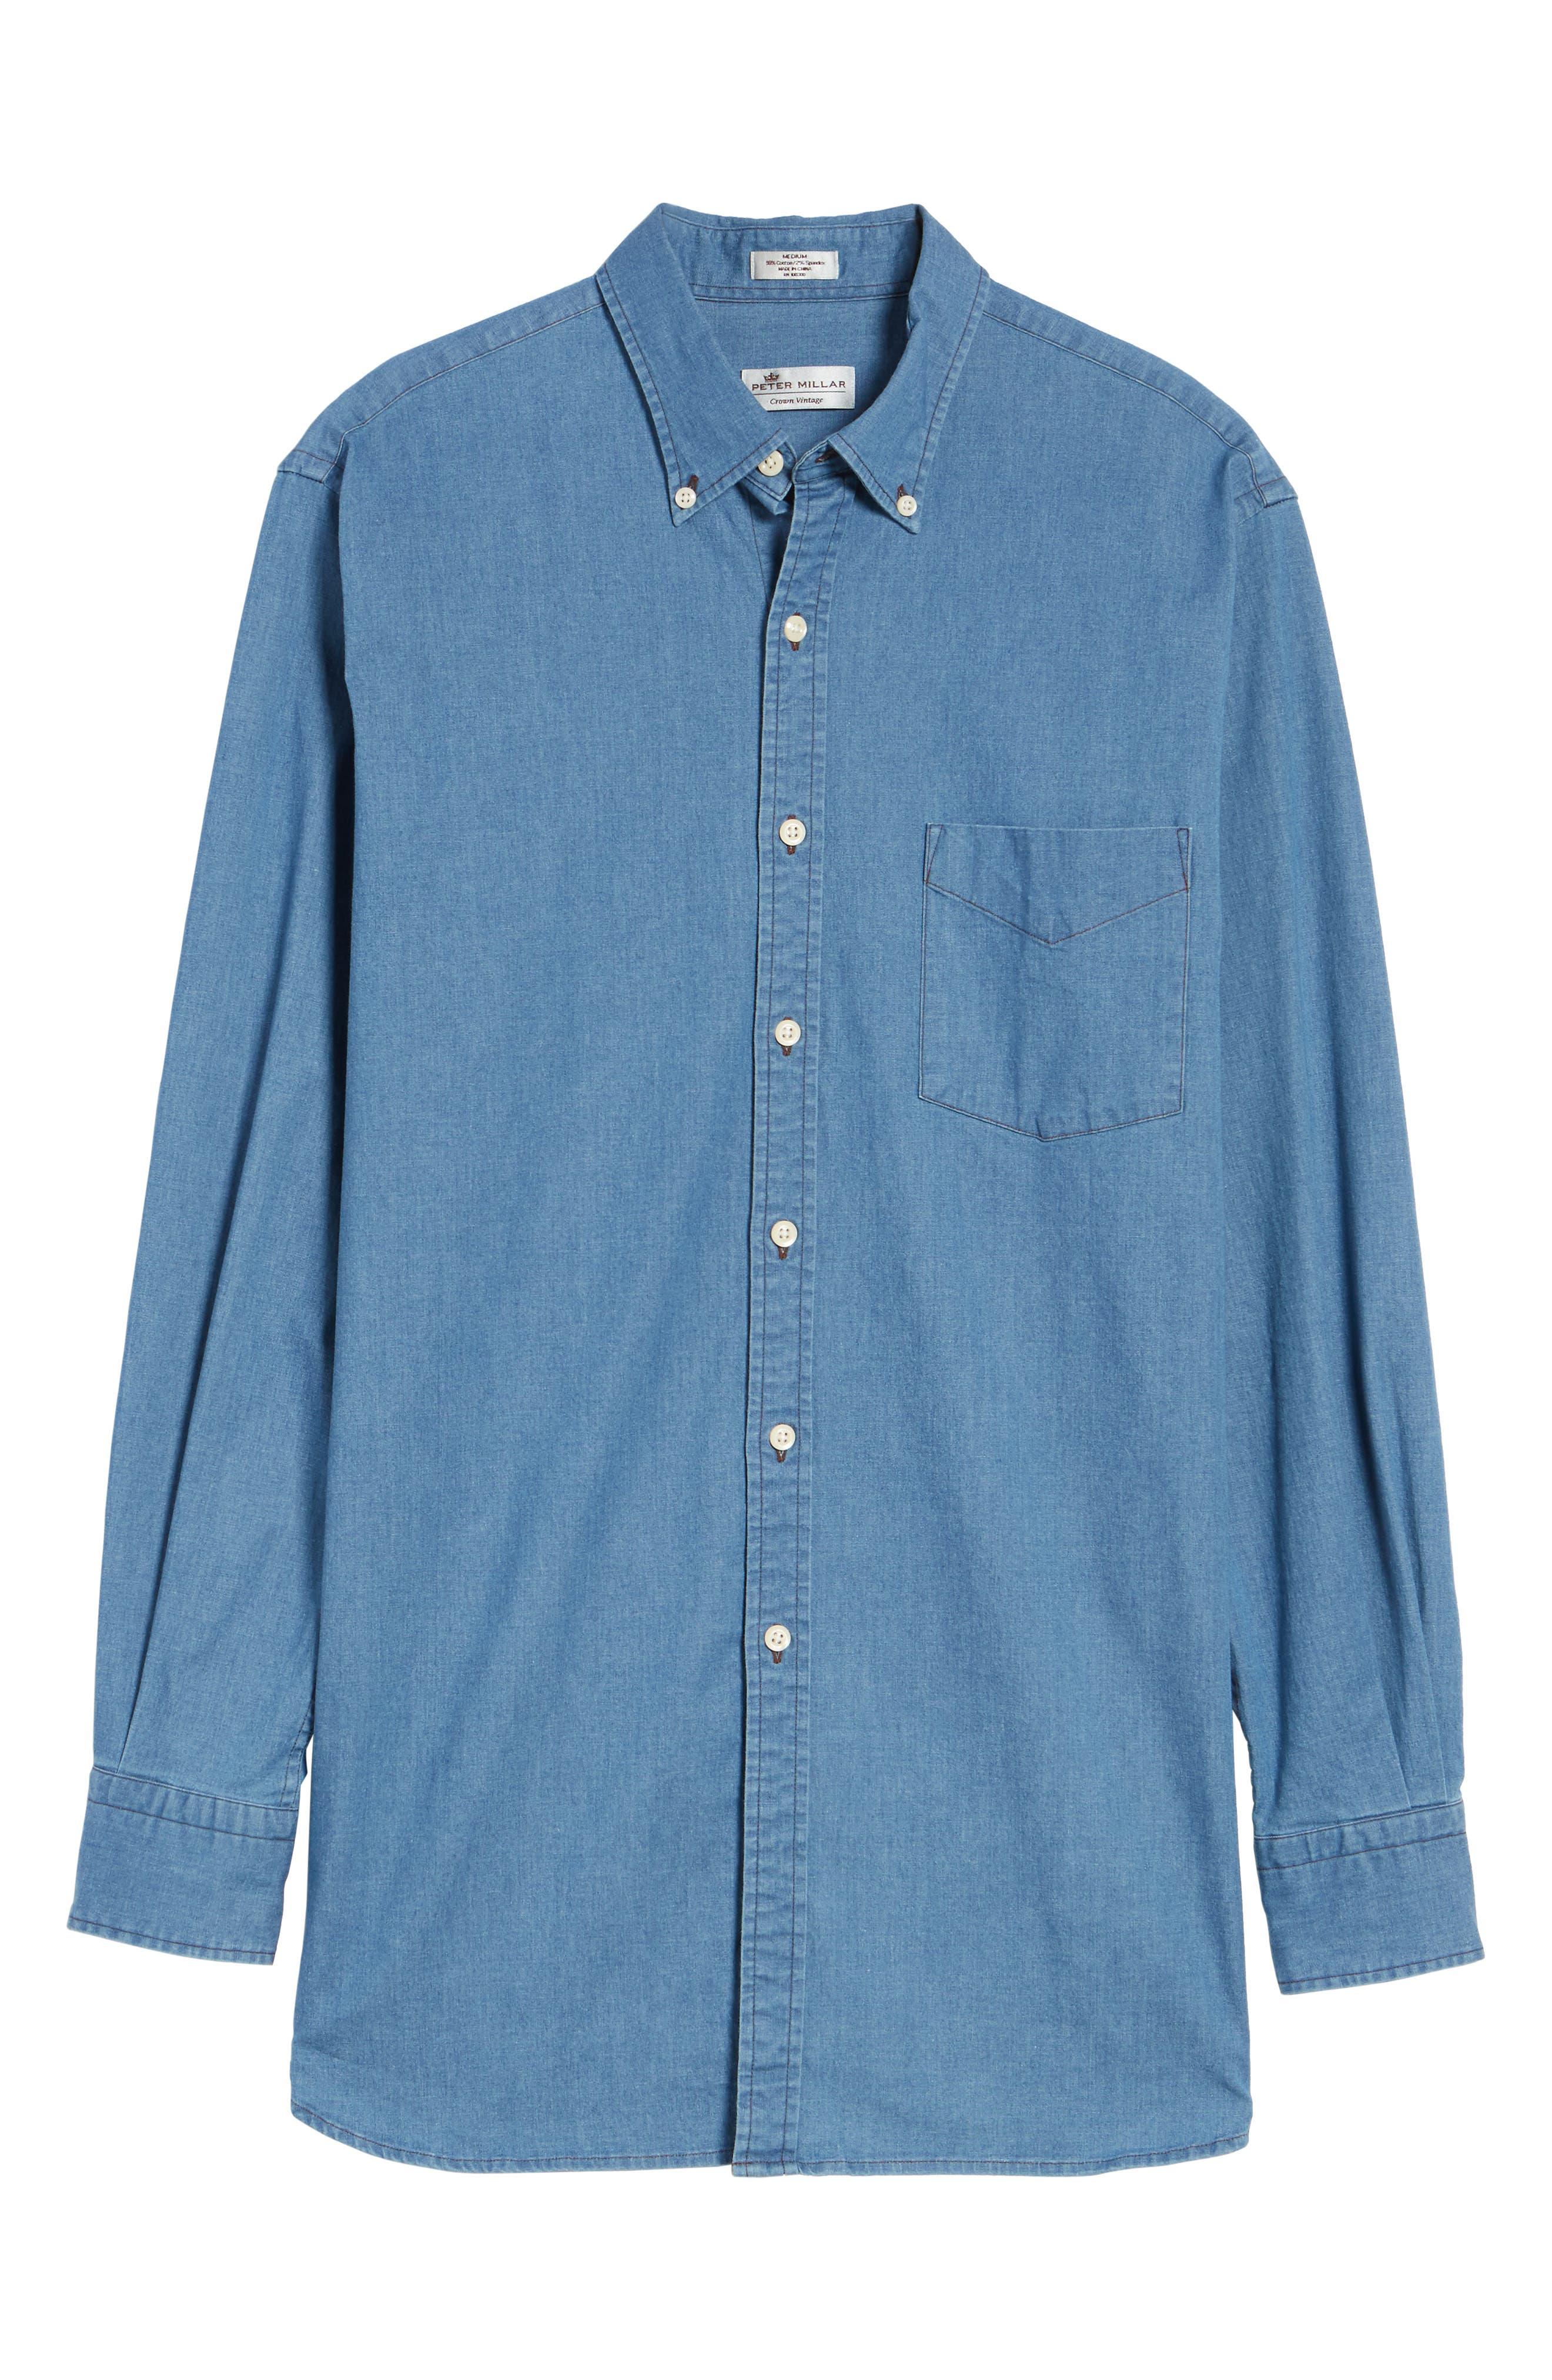 Crown Vintage Regular Fit Denim Sport Shirt,                             Alternate thumbnail 6, color,                             Indigo